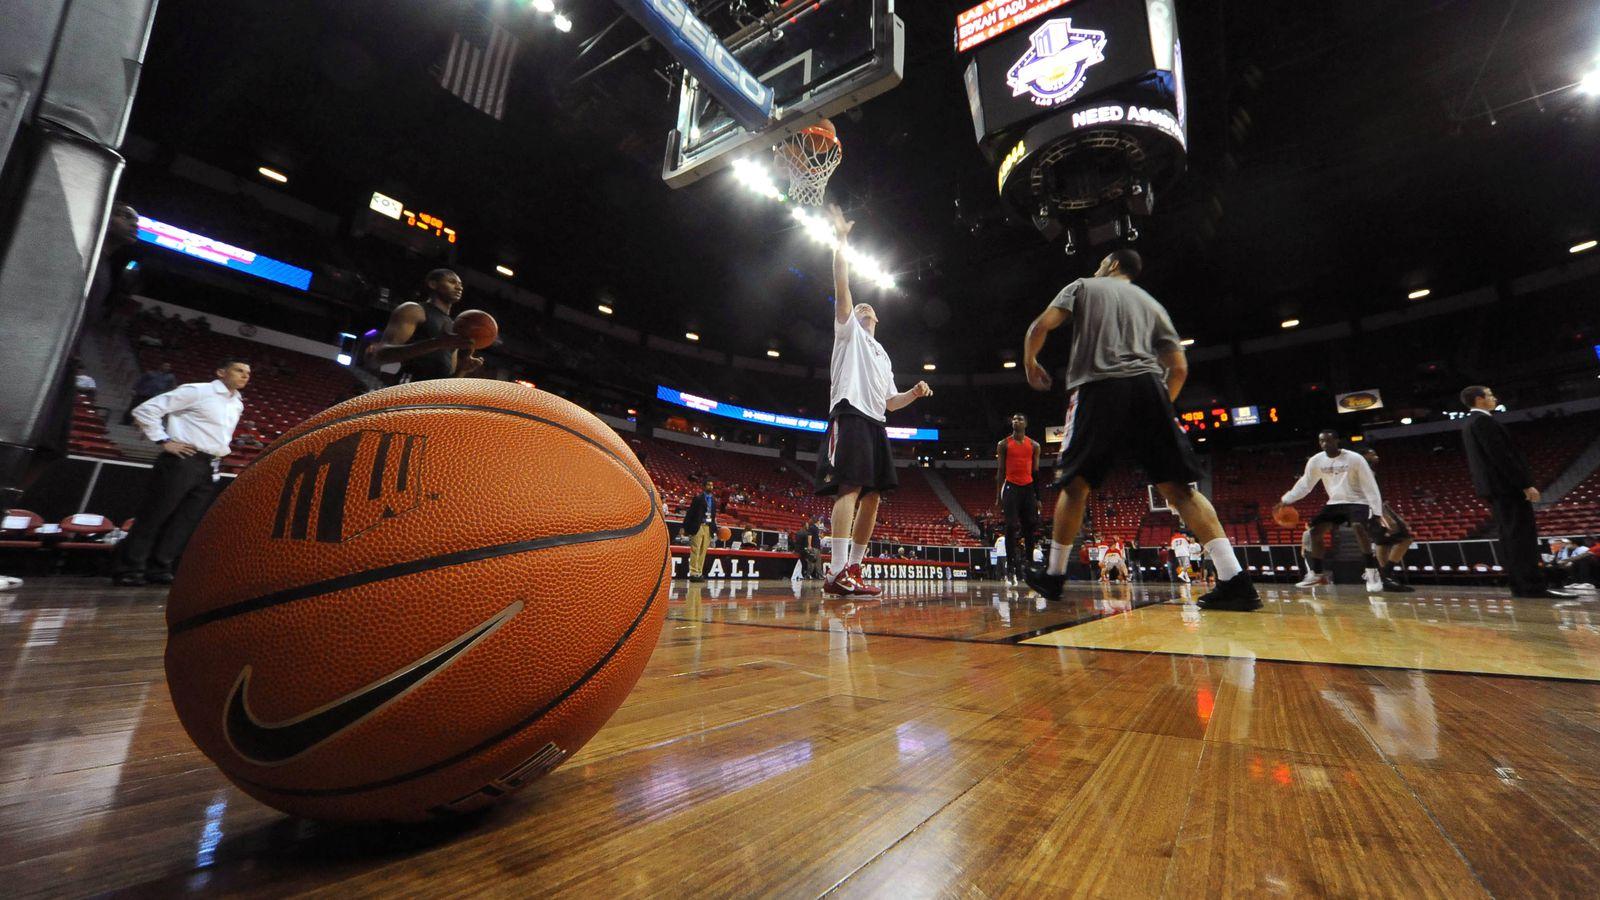 Kentucky Basketball Announces Tv Schedule Game Times And: Tbs Ncaa Basketball Announcers